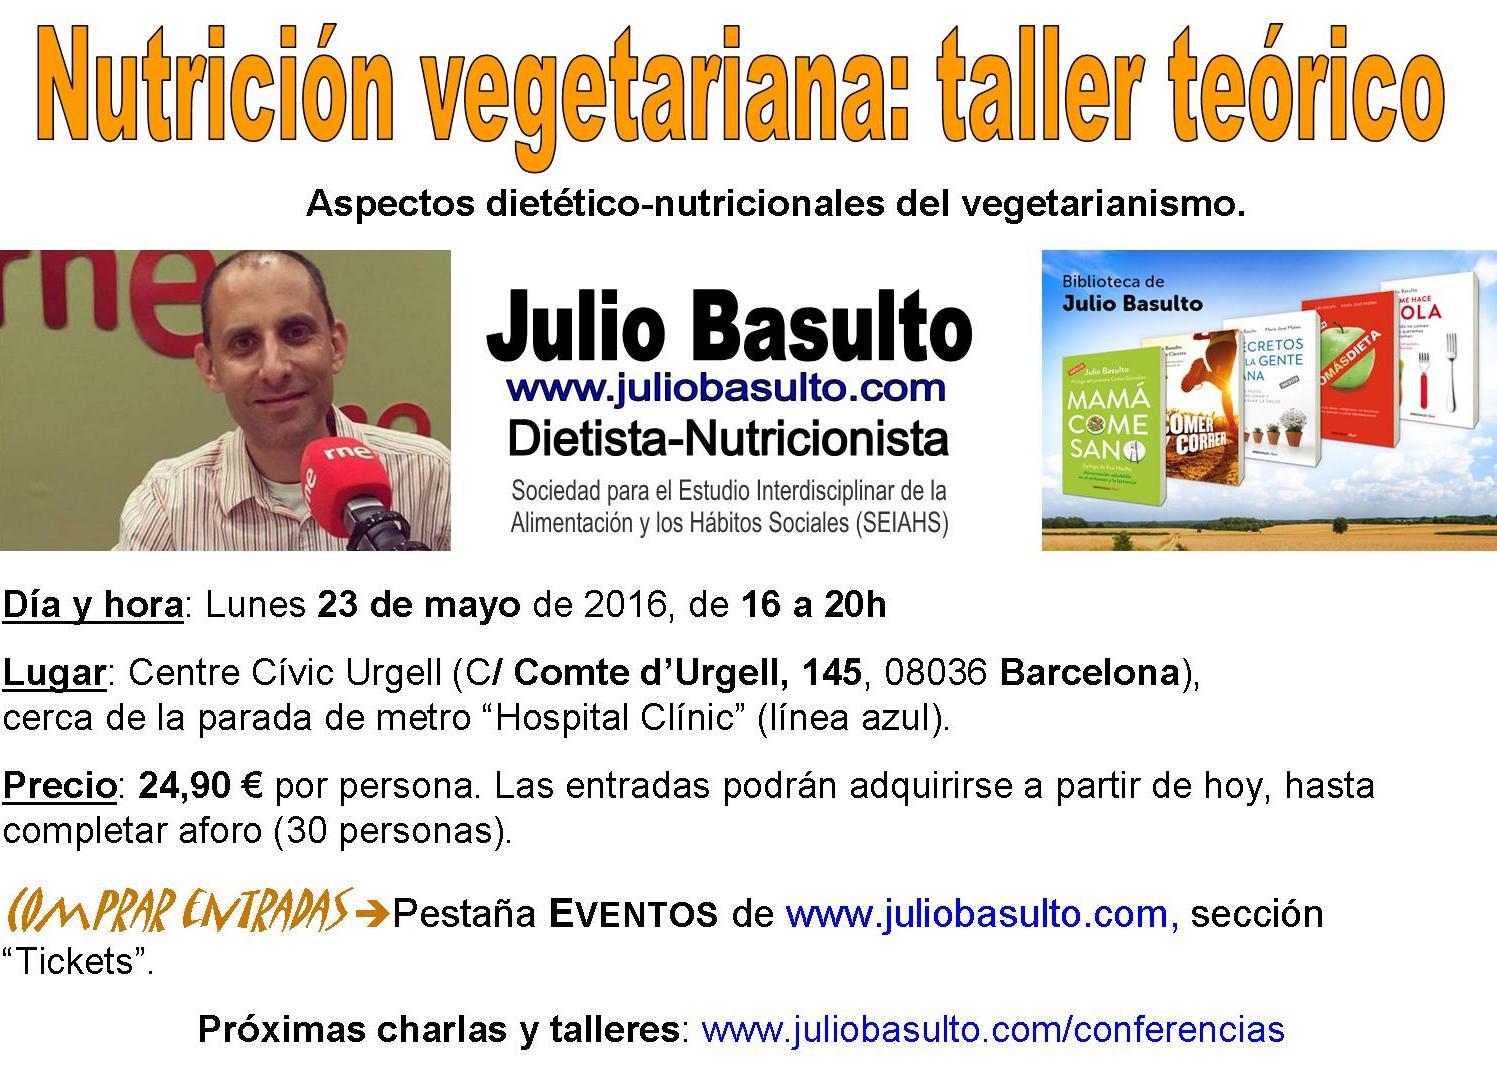 Dieta vegetariana para corredores